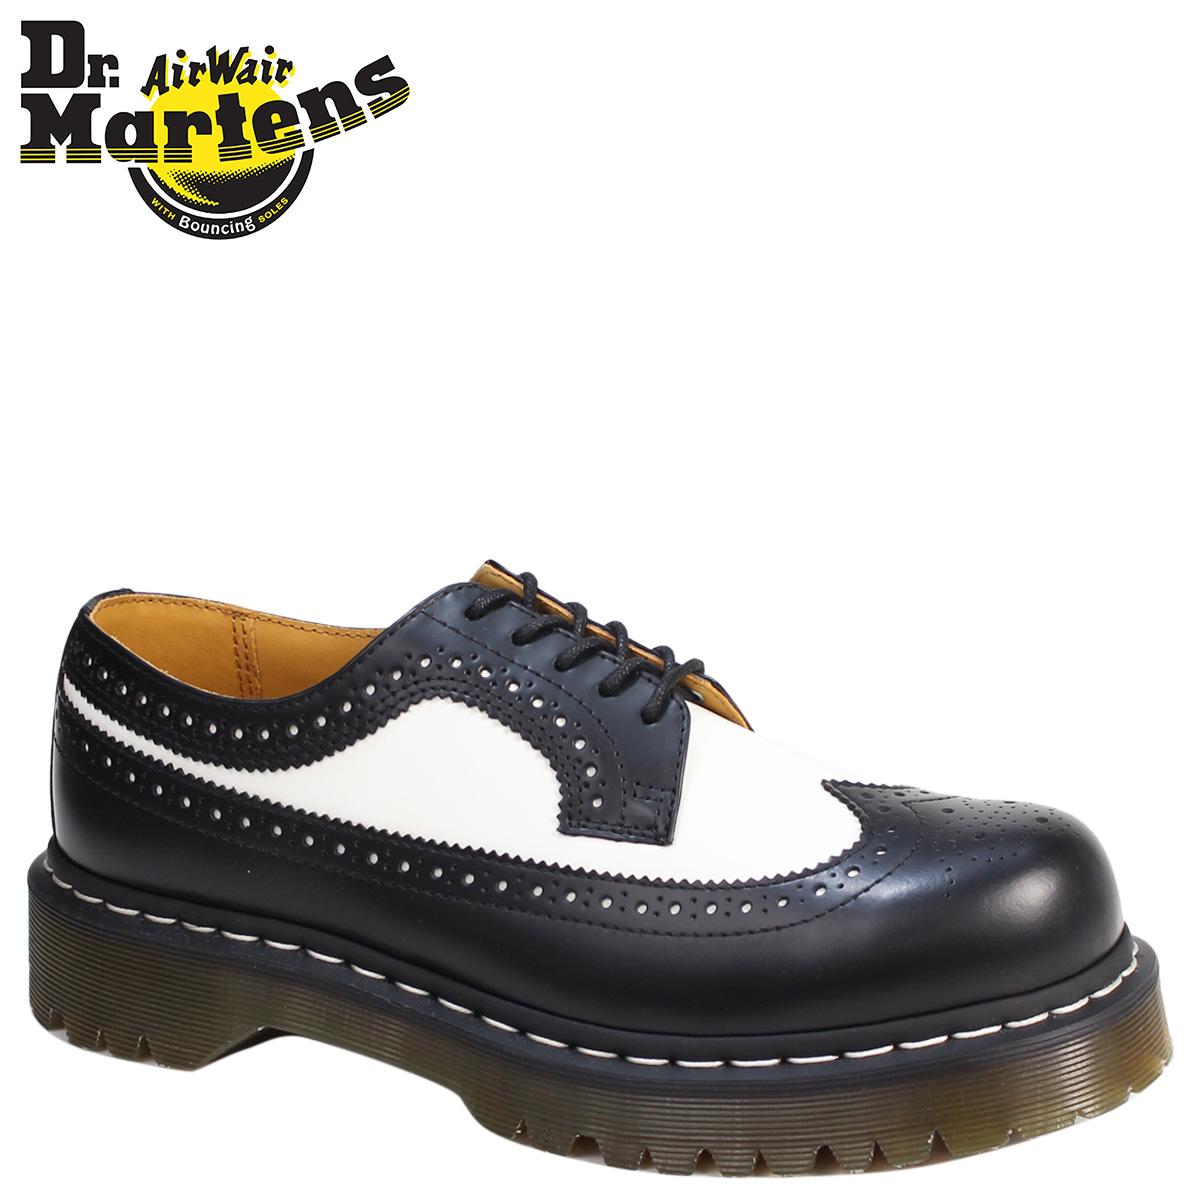 Sold Out Dr Martens 5 Hall Wing Tip Shoes Brogue Bex Sole Men S Las 10458001 398996019 3989 Black X White Uni Genuine